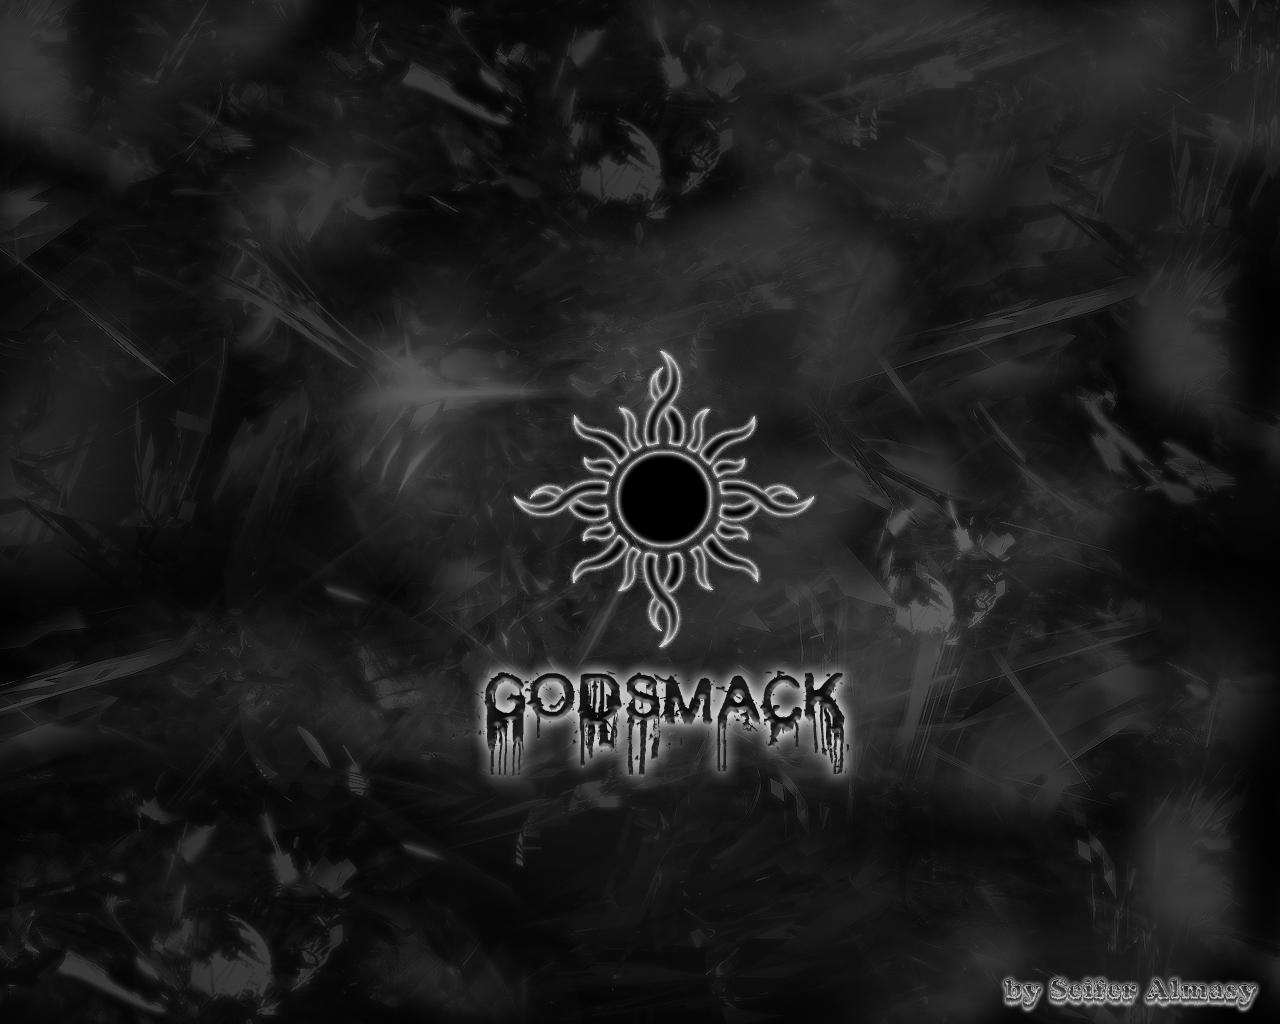 godsmack wallpaper 01 by seiferatus on deviantart